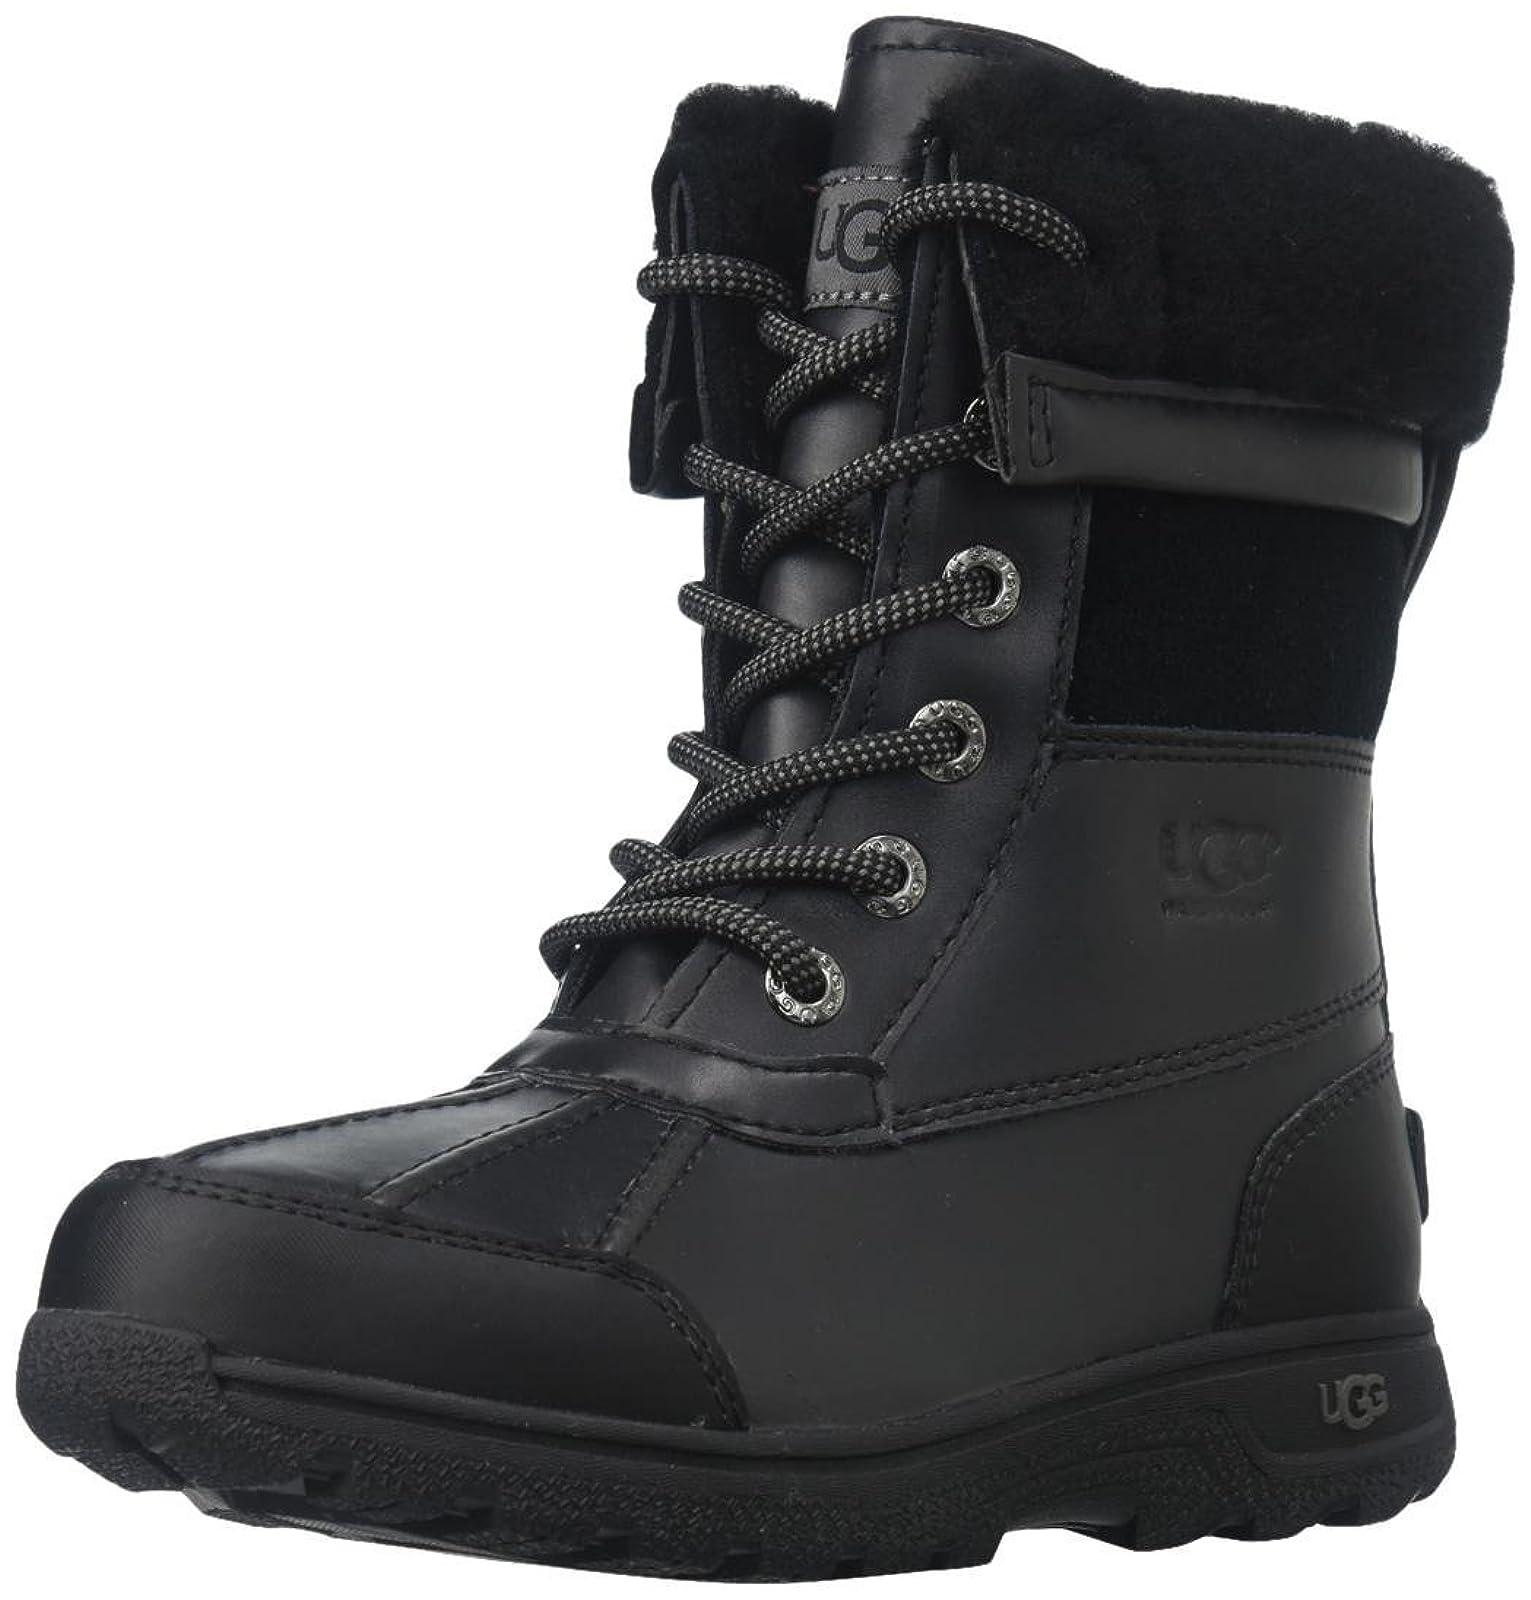 20dcb47d553 UGG Kids K Butte II Lace-up Boot K BUTTE II_K Worchester